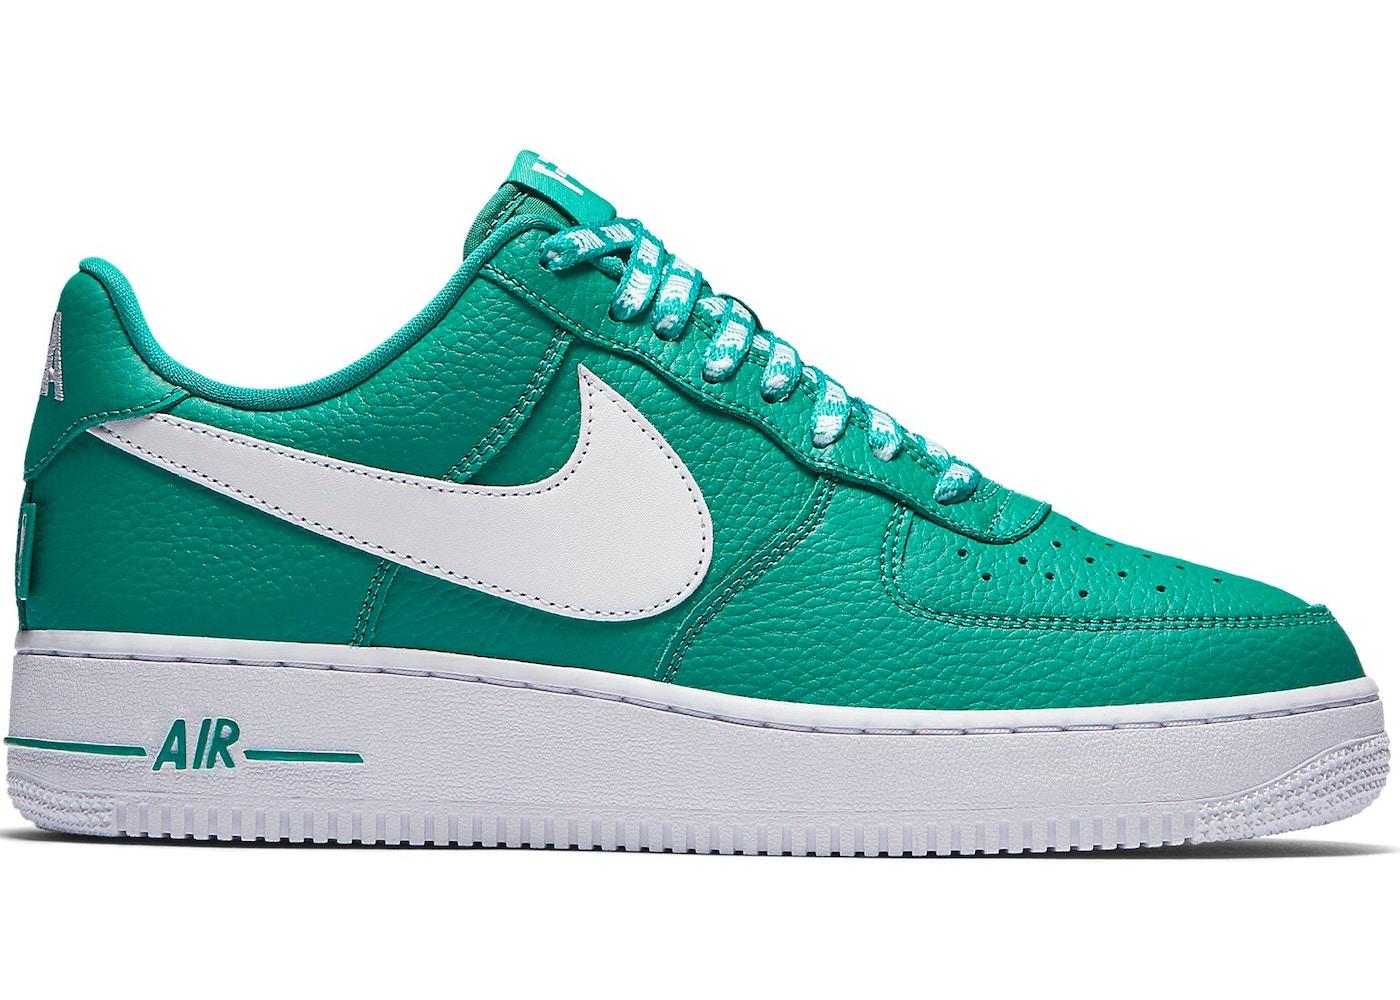 Abrumar productos quimicos para castigar  Nike Air Force 1 Low NBA Neptune Green - 823511-302